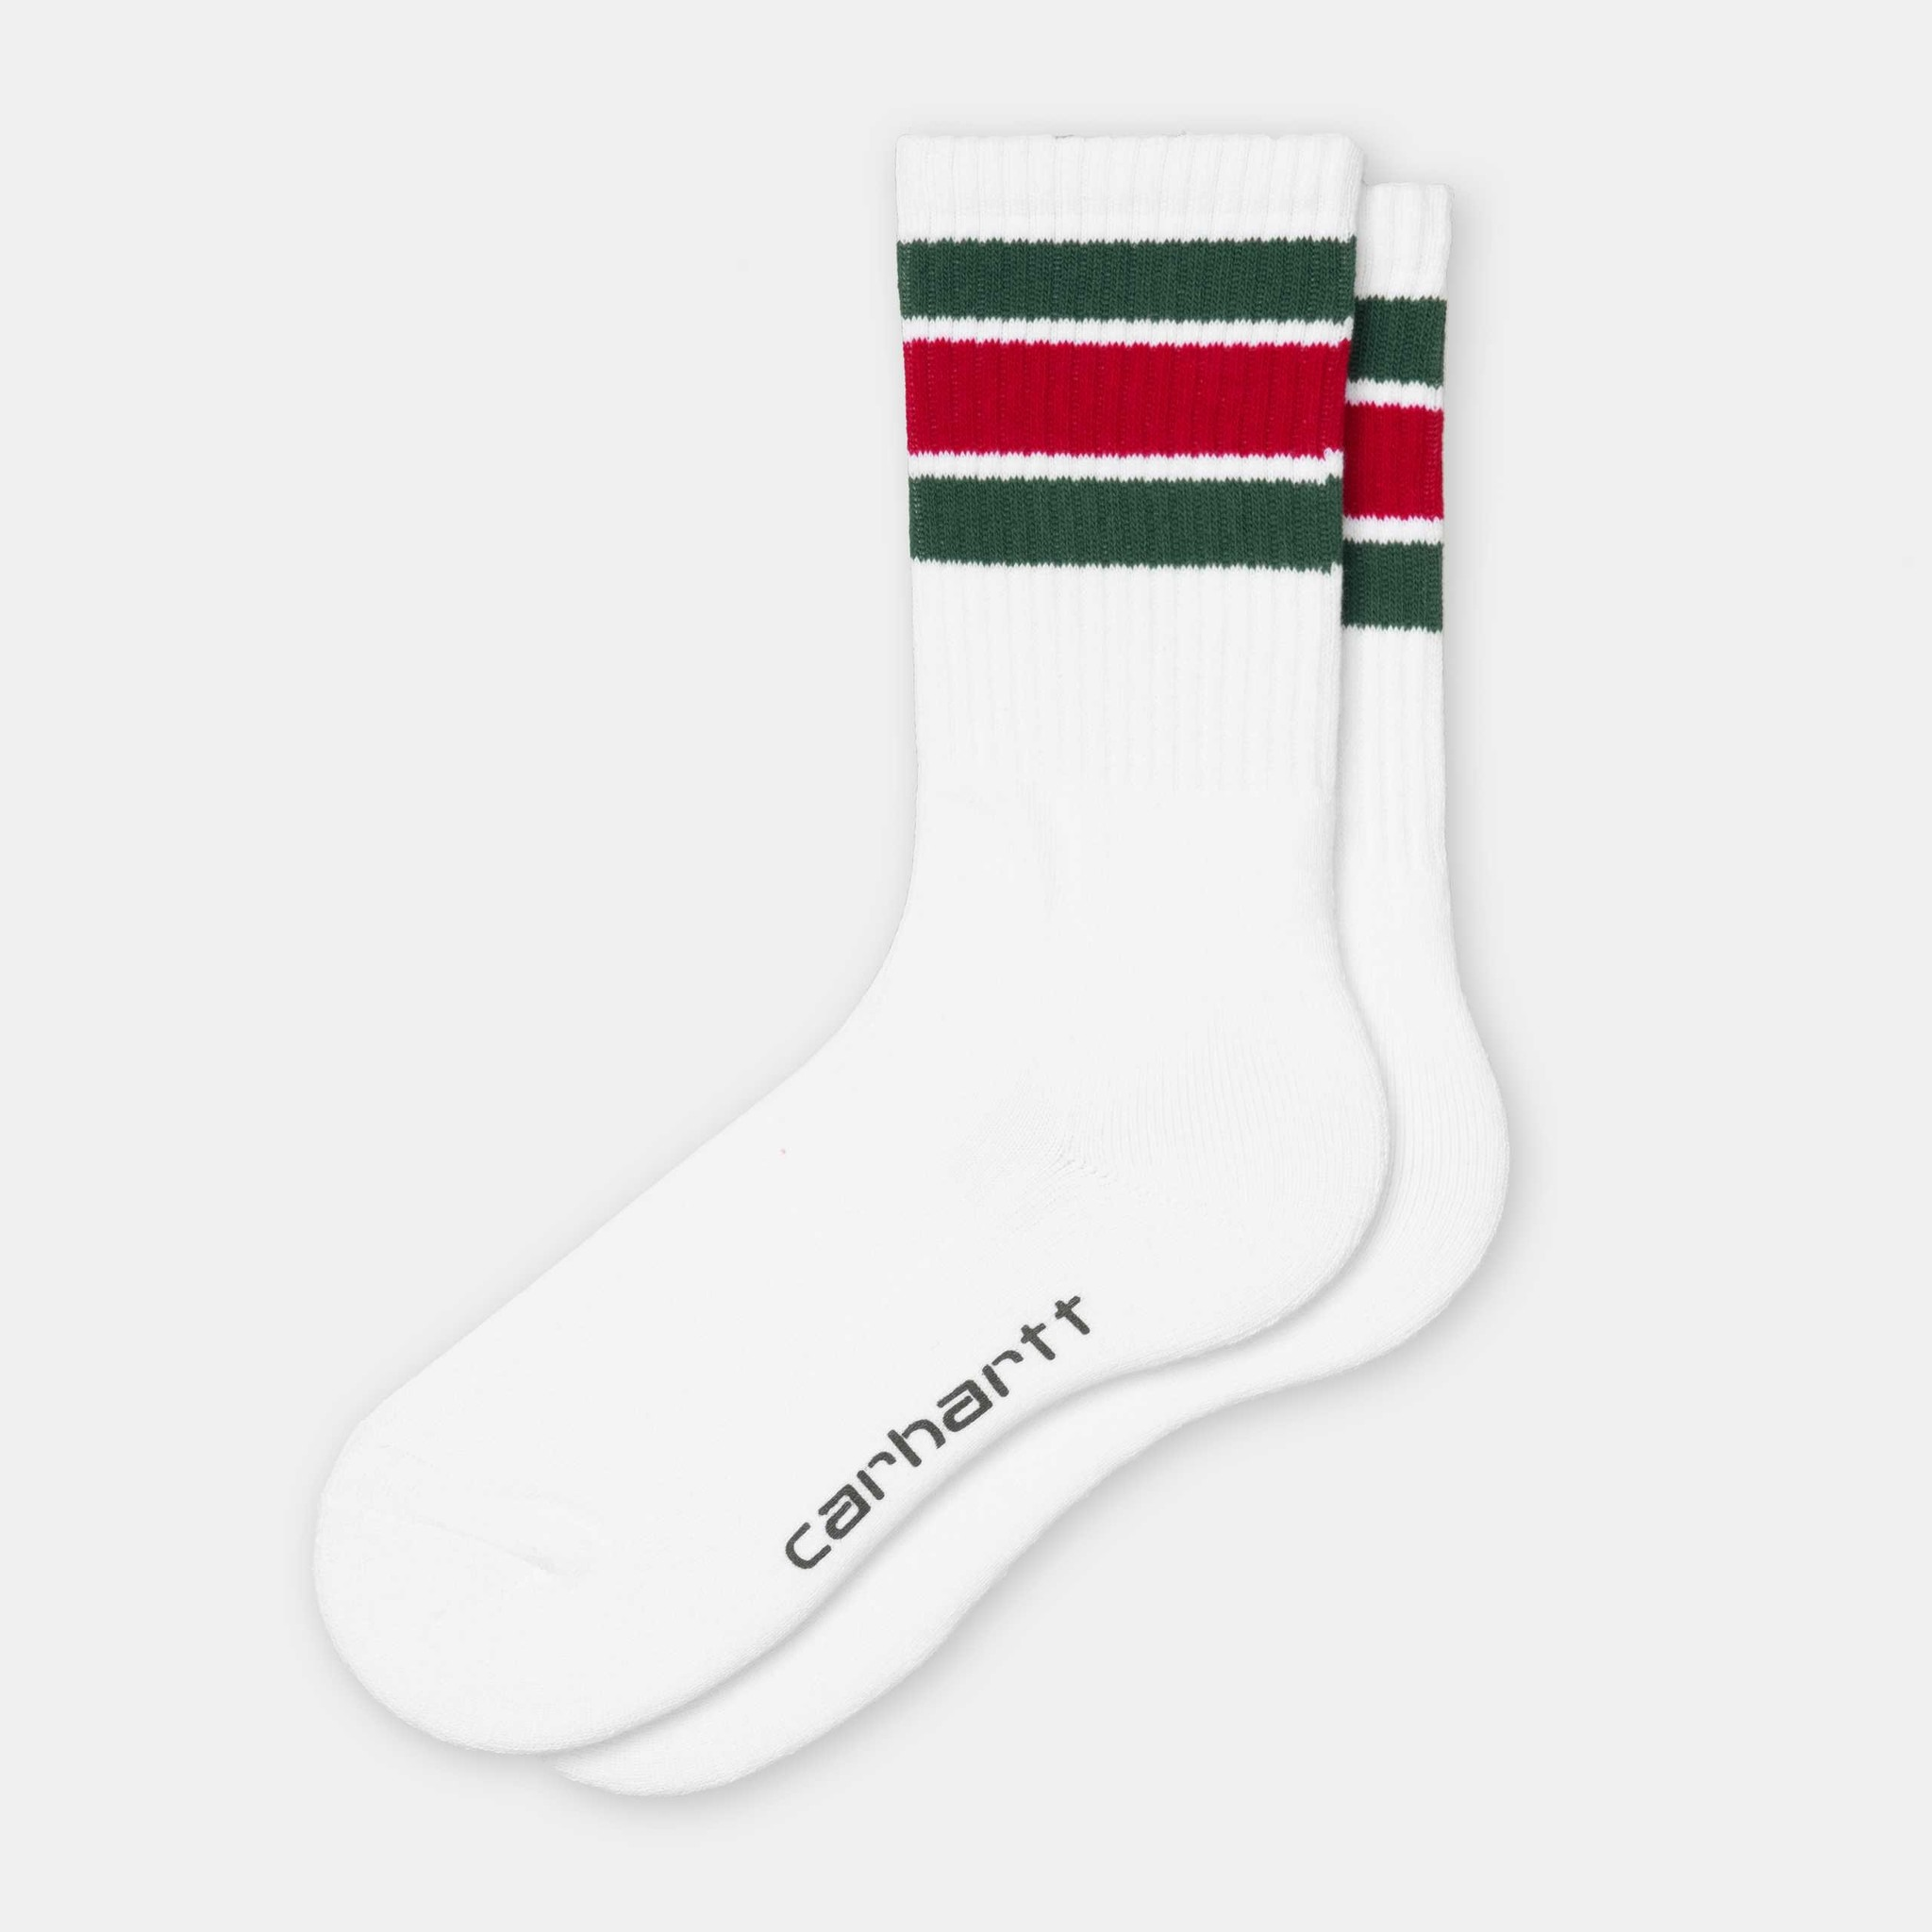 Carhartt Carhartt Grant Socks